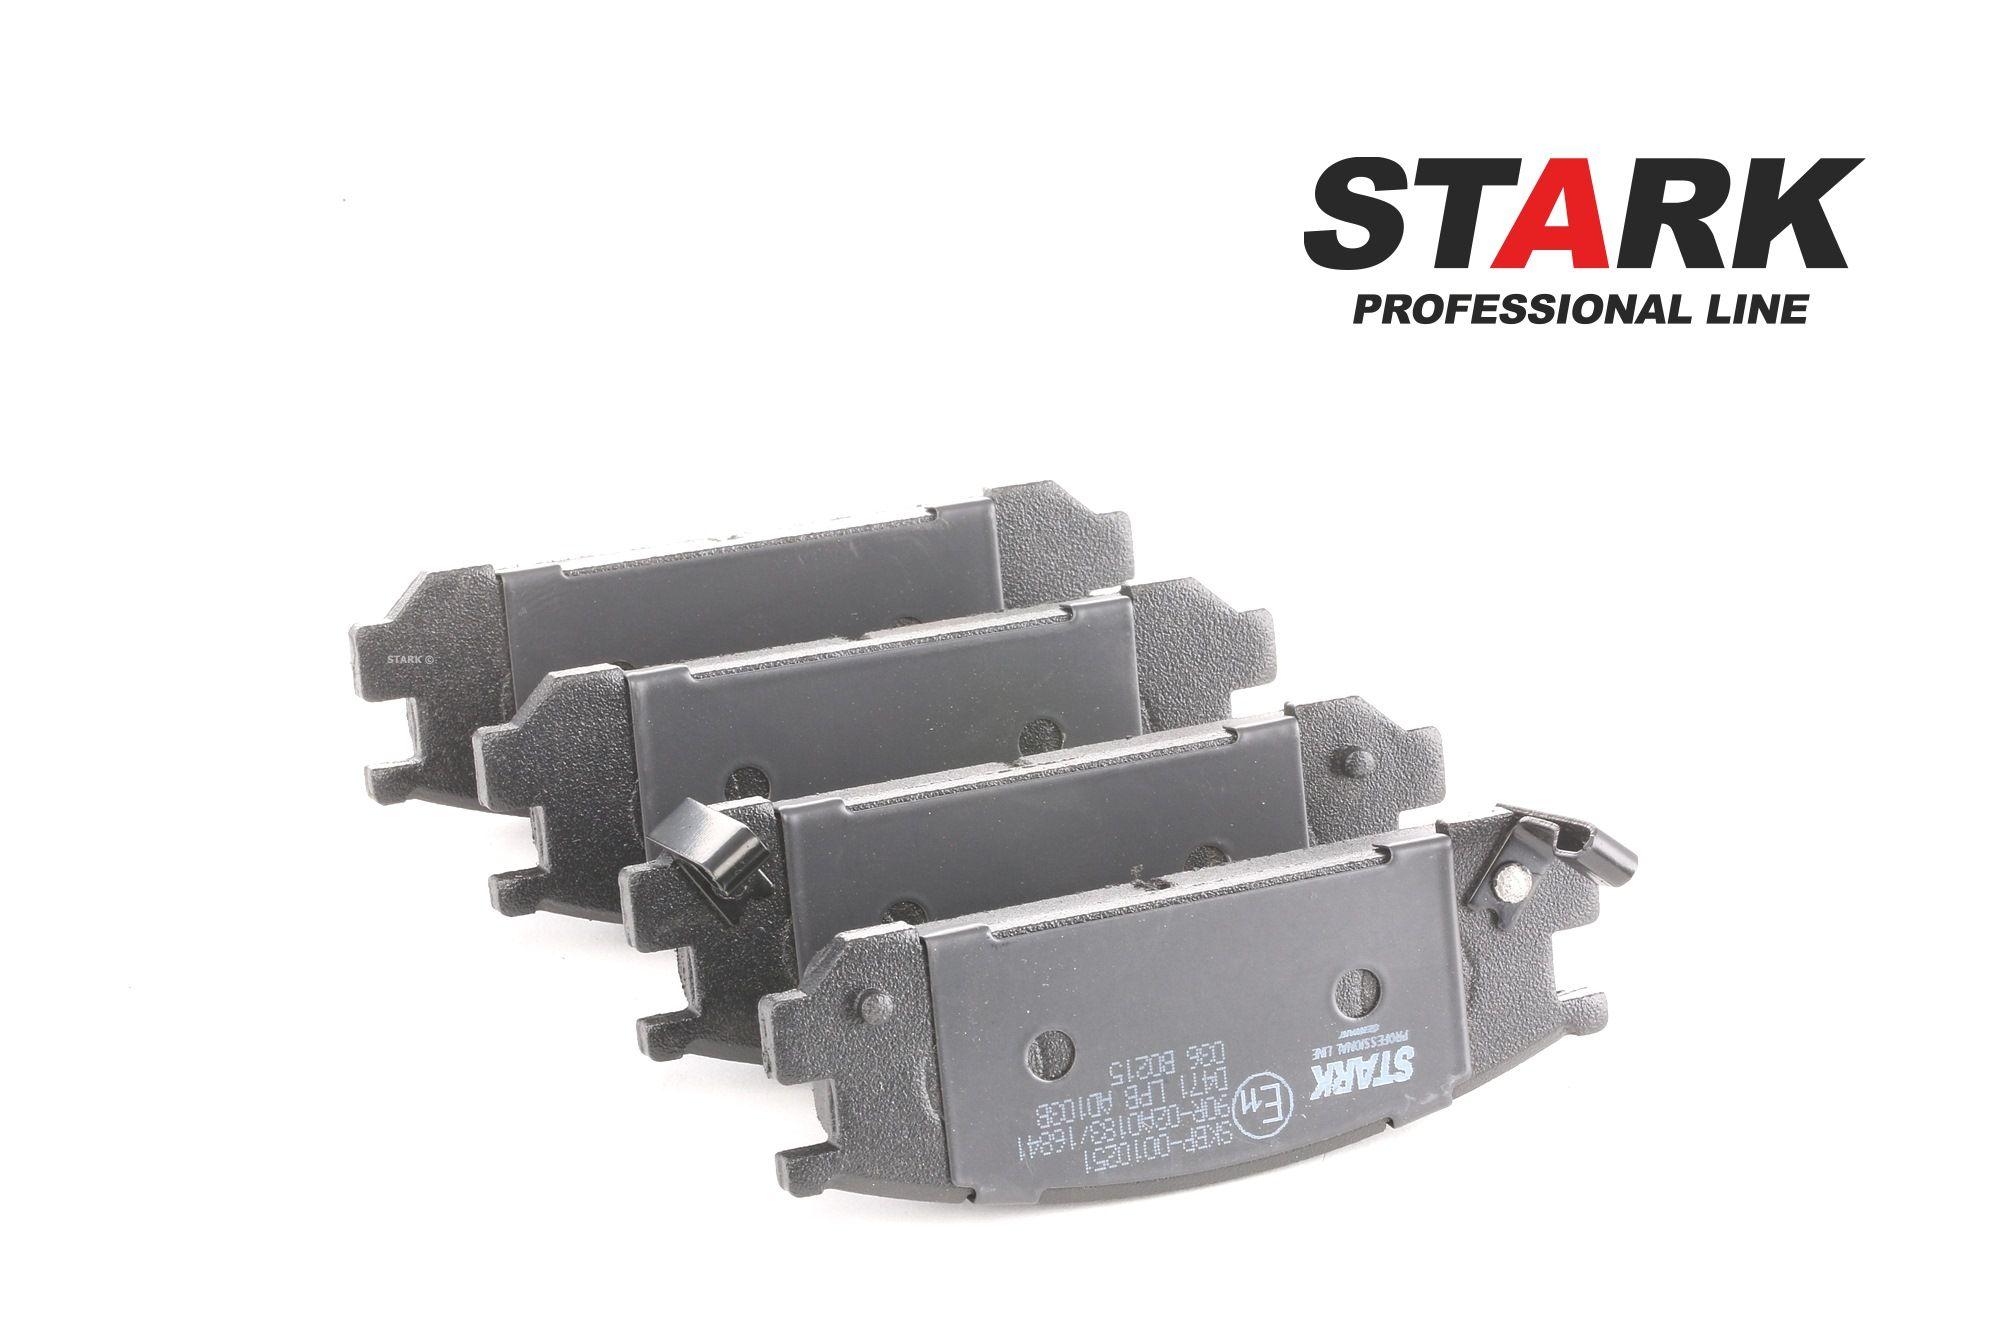 SUBARU SVX 1996 Bremsbelagsatz - Original STARK SKBP-0010251 Höhe: 38,8mm, Breite: 107,6mm, Dicke/Stärke: 15mm